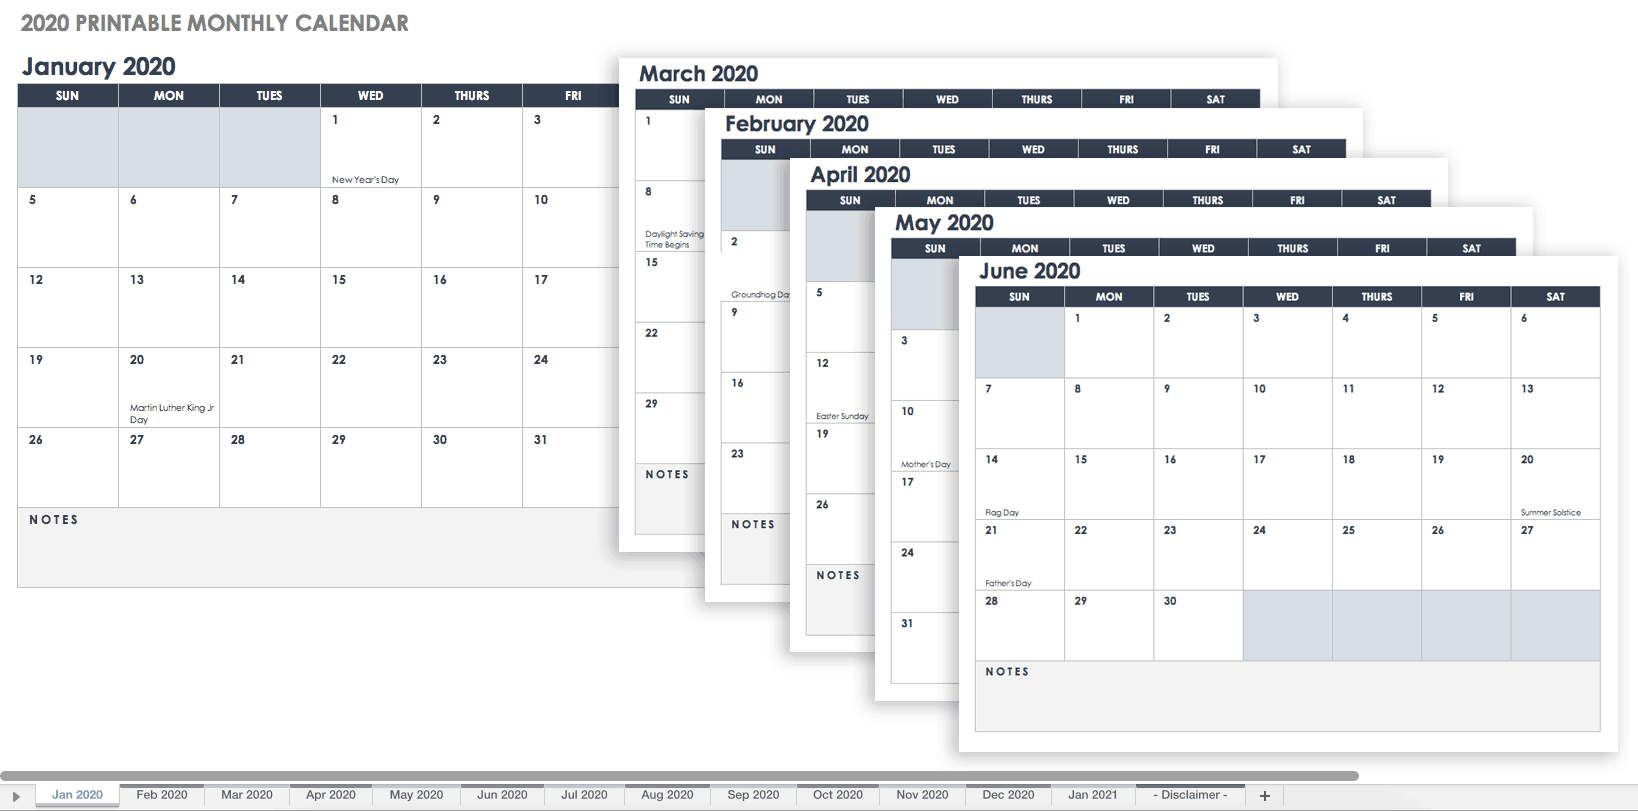 004 Ic Printable Monthly Calendar Landscape Template Ideas with regard to 2020 Printable Monthly Calendar Free Vertex